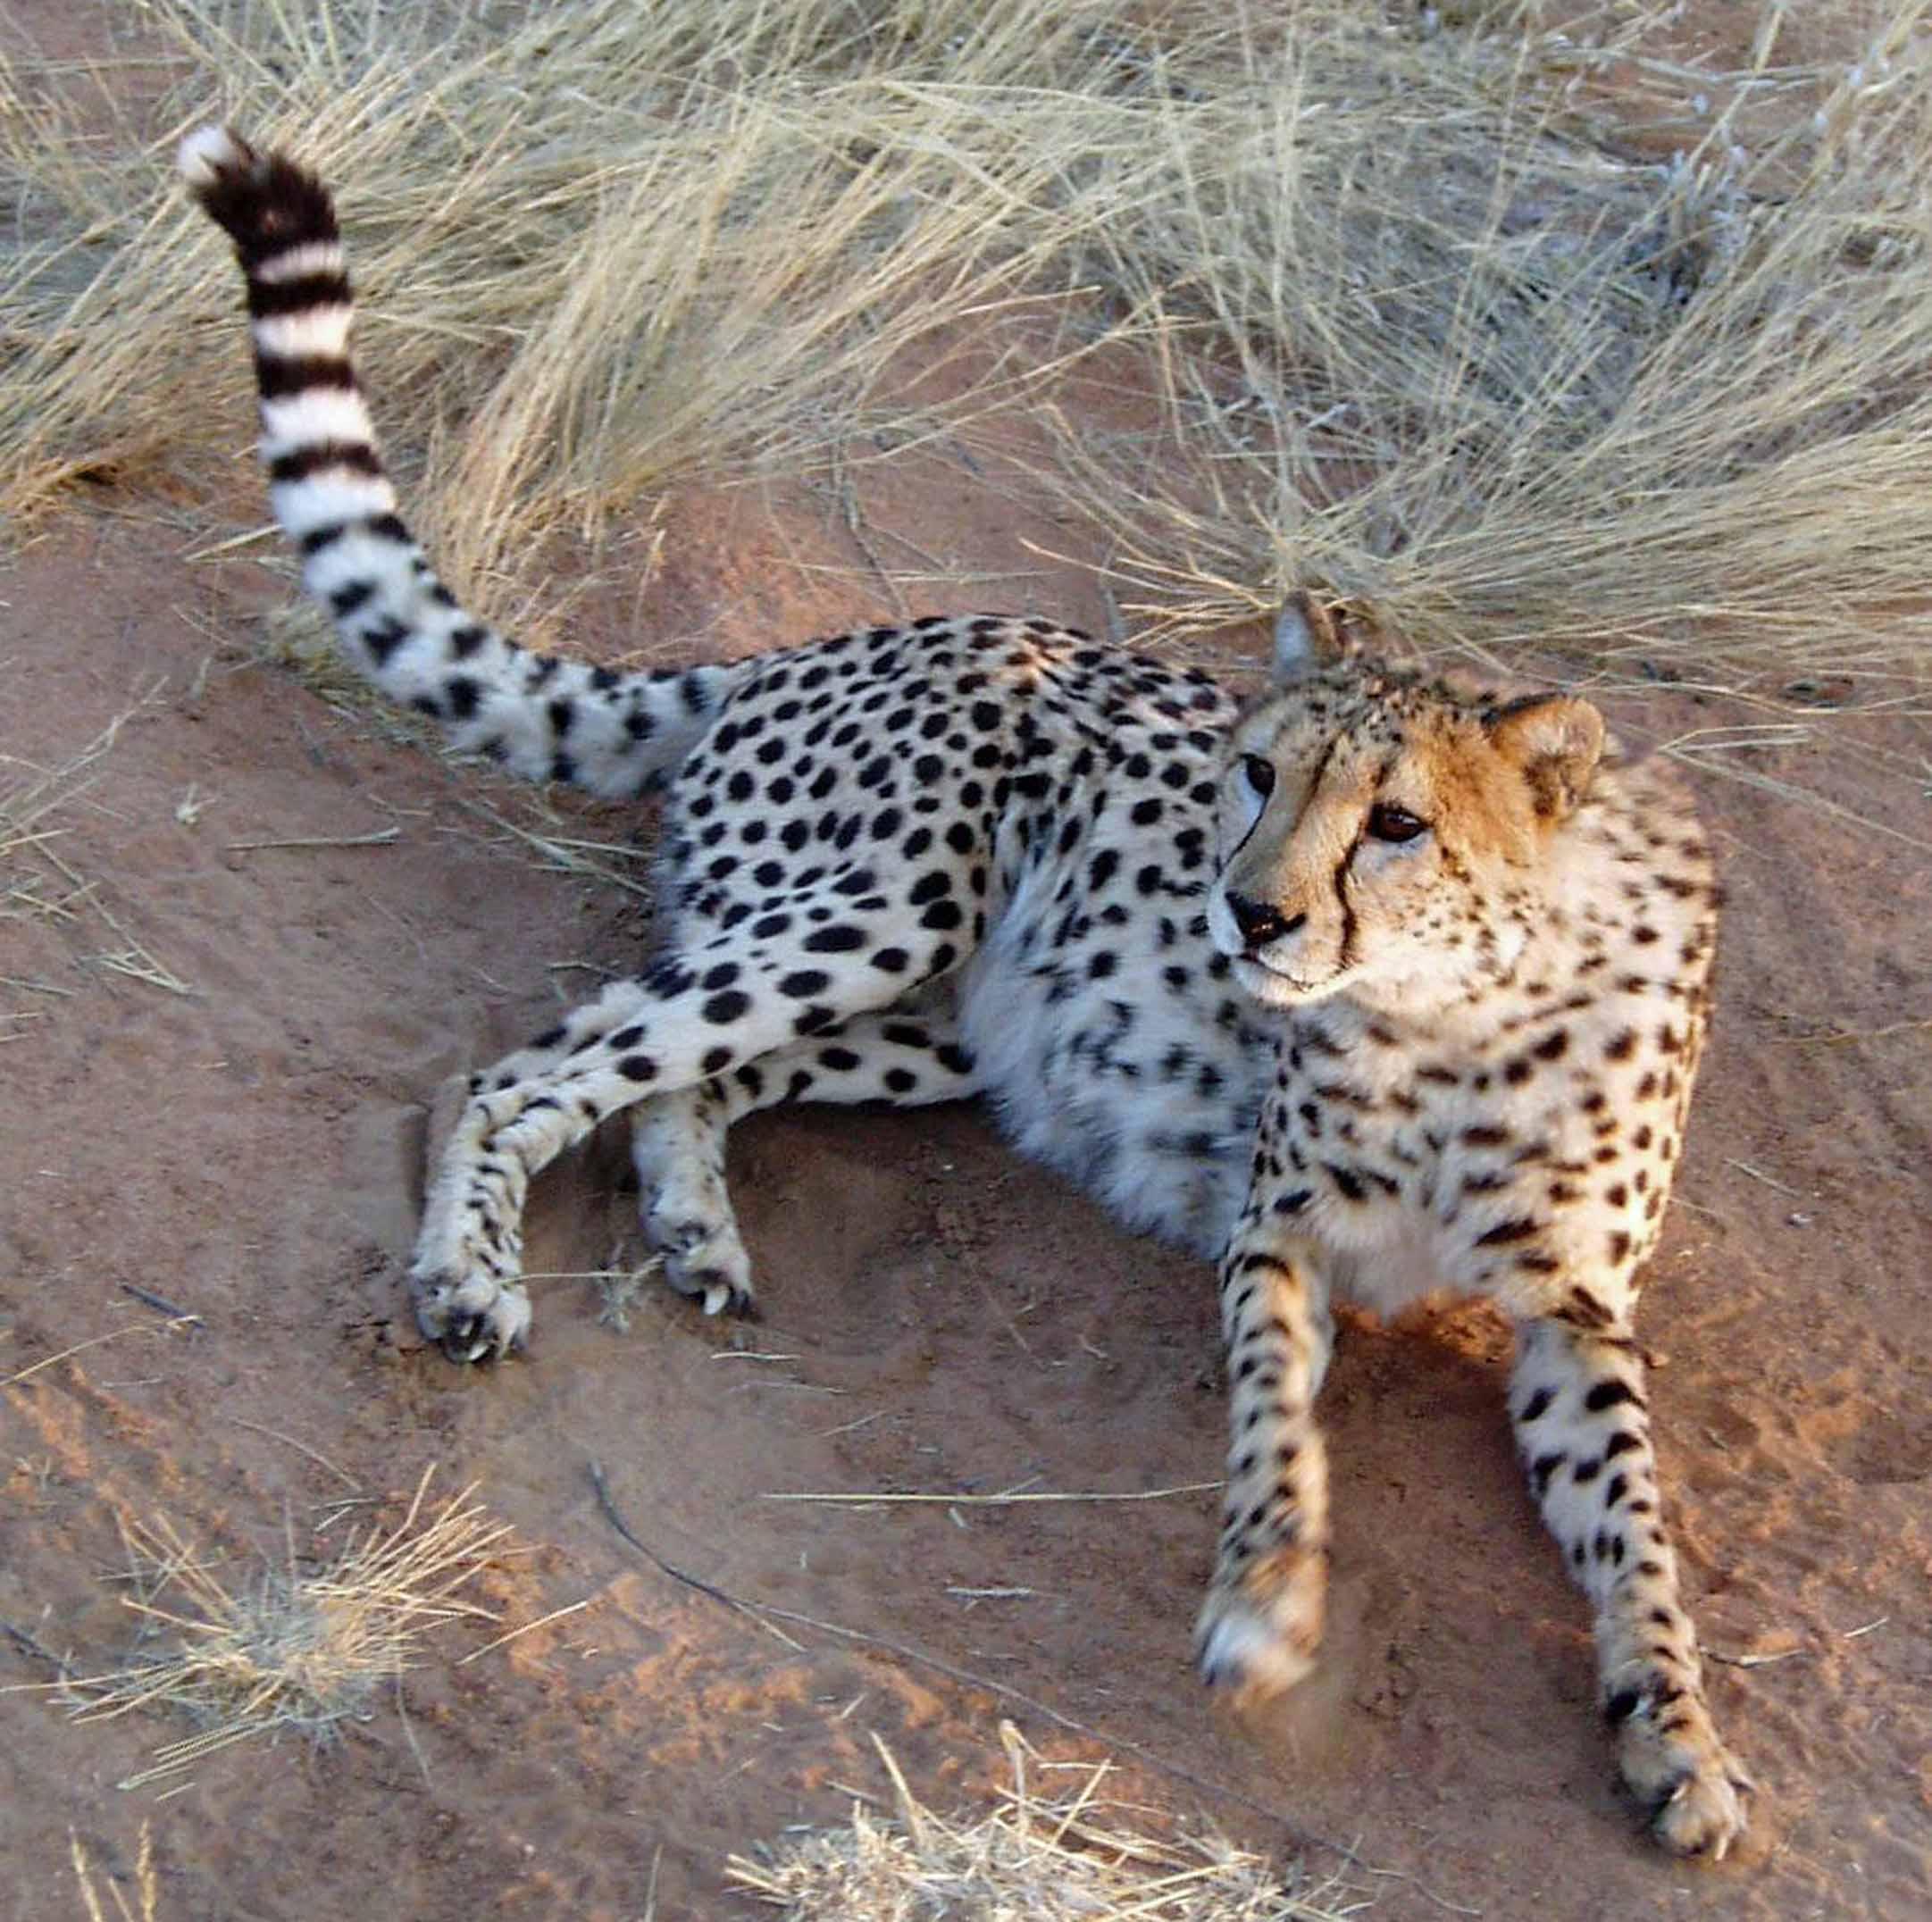 Cheetah sitting on dry earth